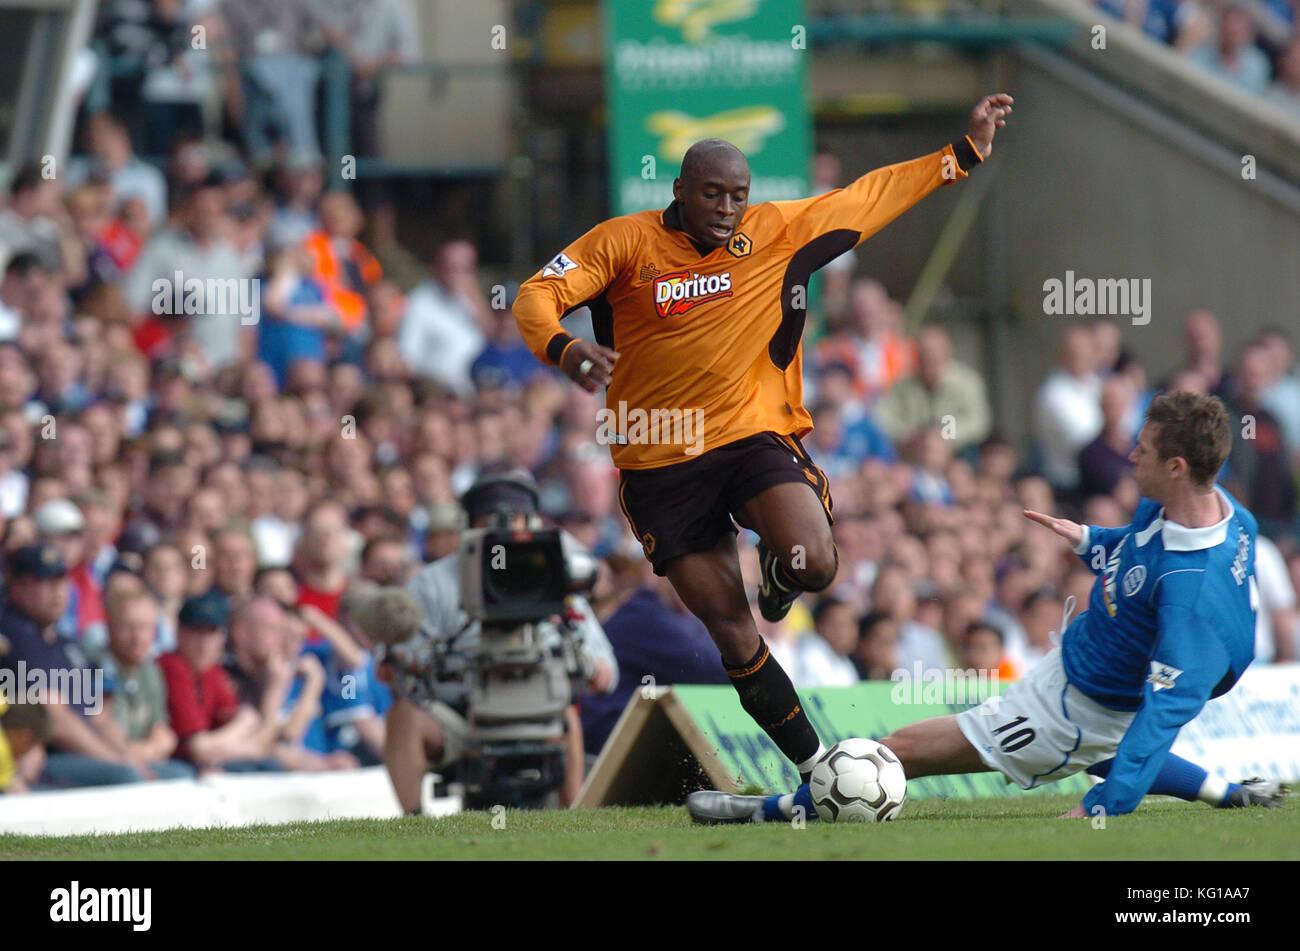 Footballer Shaun Newton Birmingham City v Wolverhampton Wanderers 25 April 2004 - Stock Image